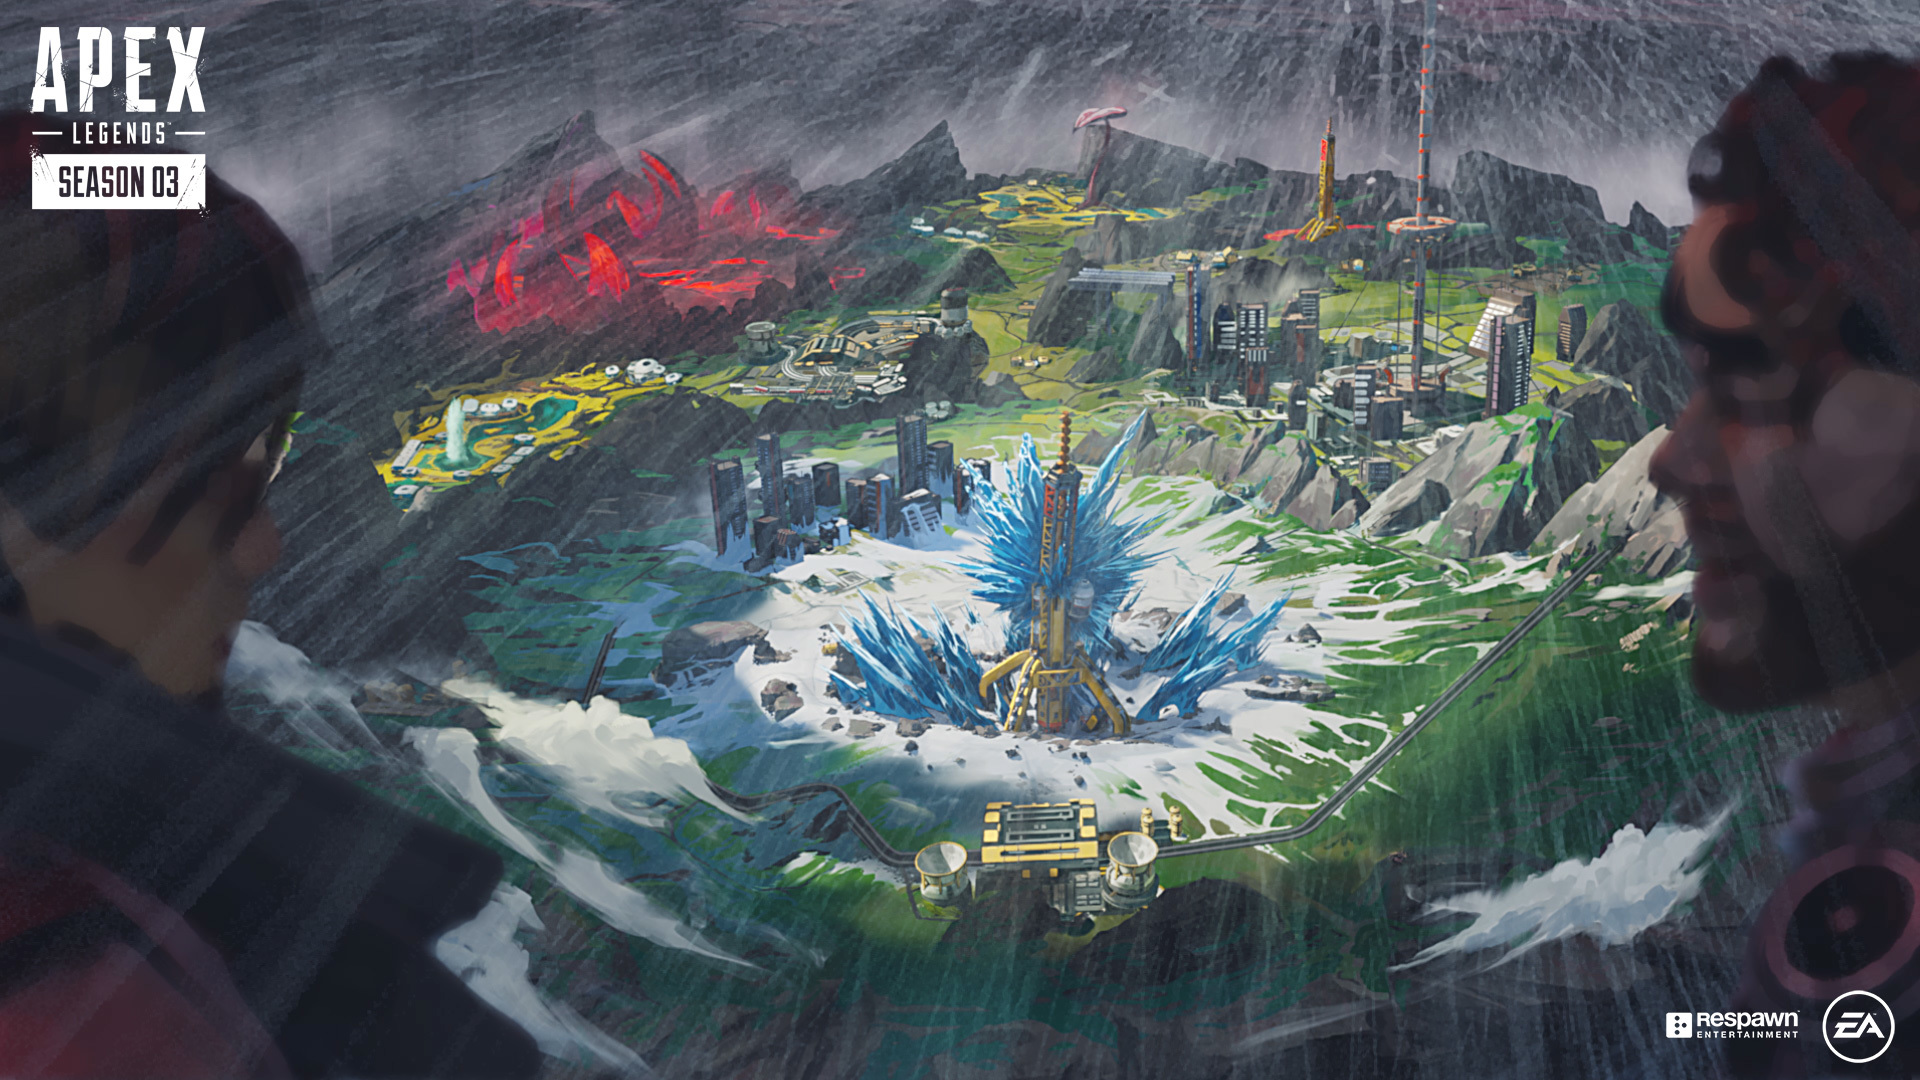 Apex Legends Season 3 Hands On Impressions Preview Gamereactor